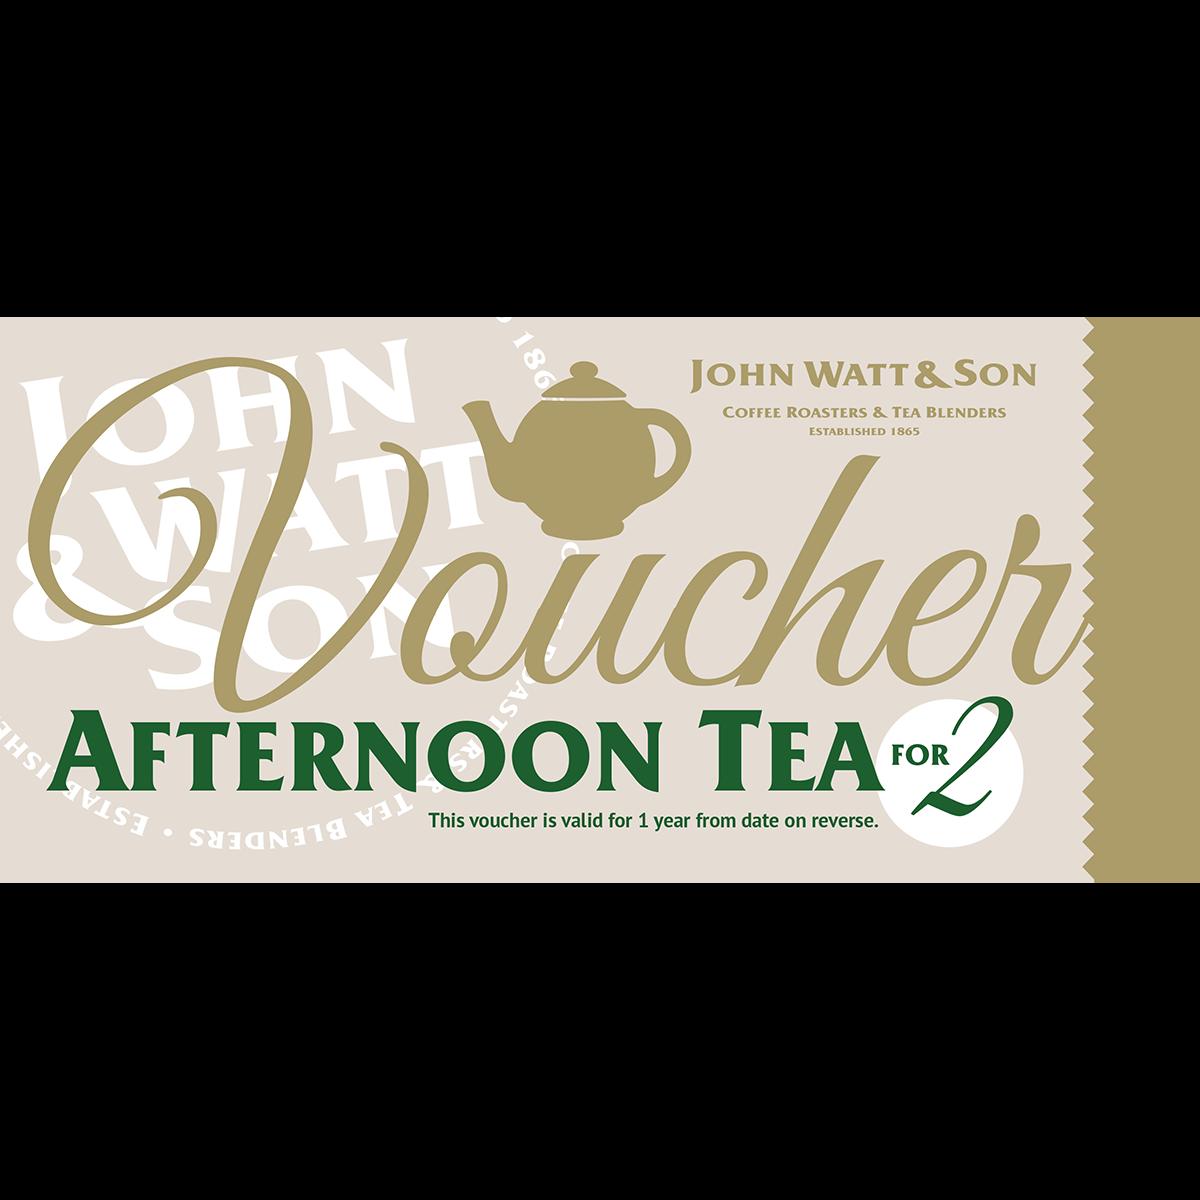 afternoon-tea-vouchers-john-watt